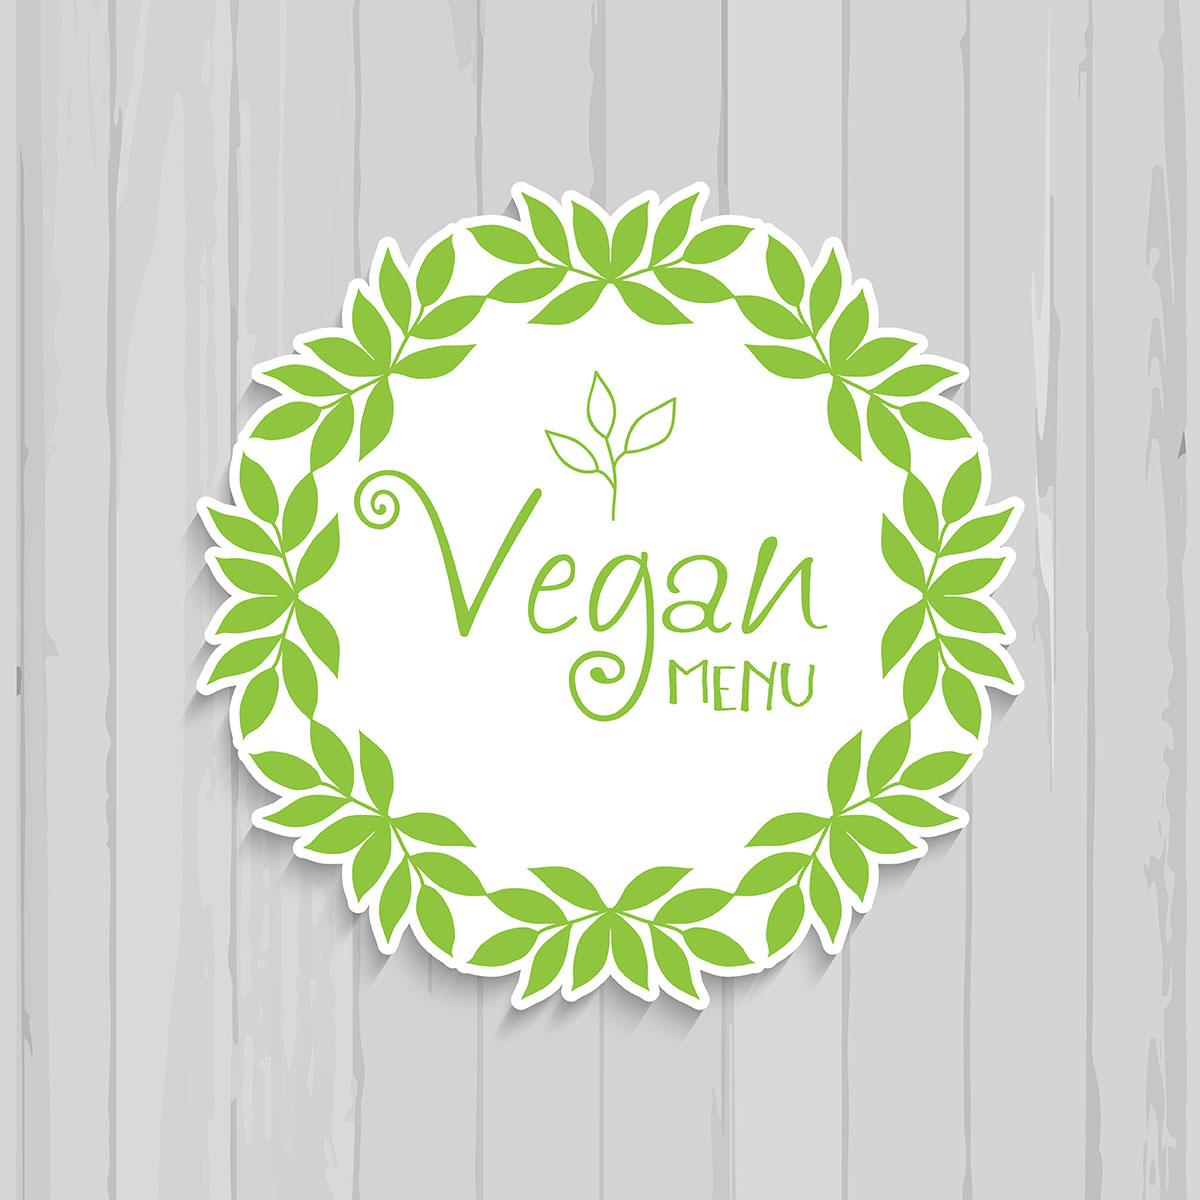 1200x1200 Vegan Free Vector Art